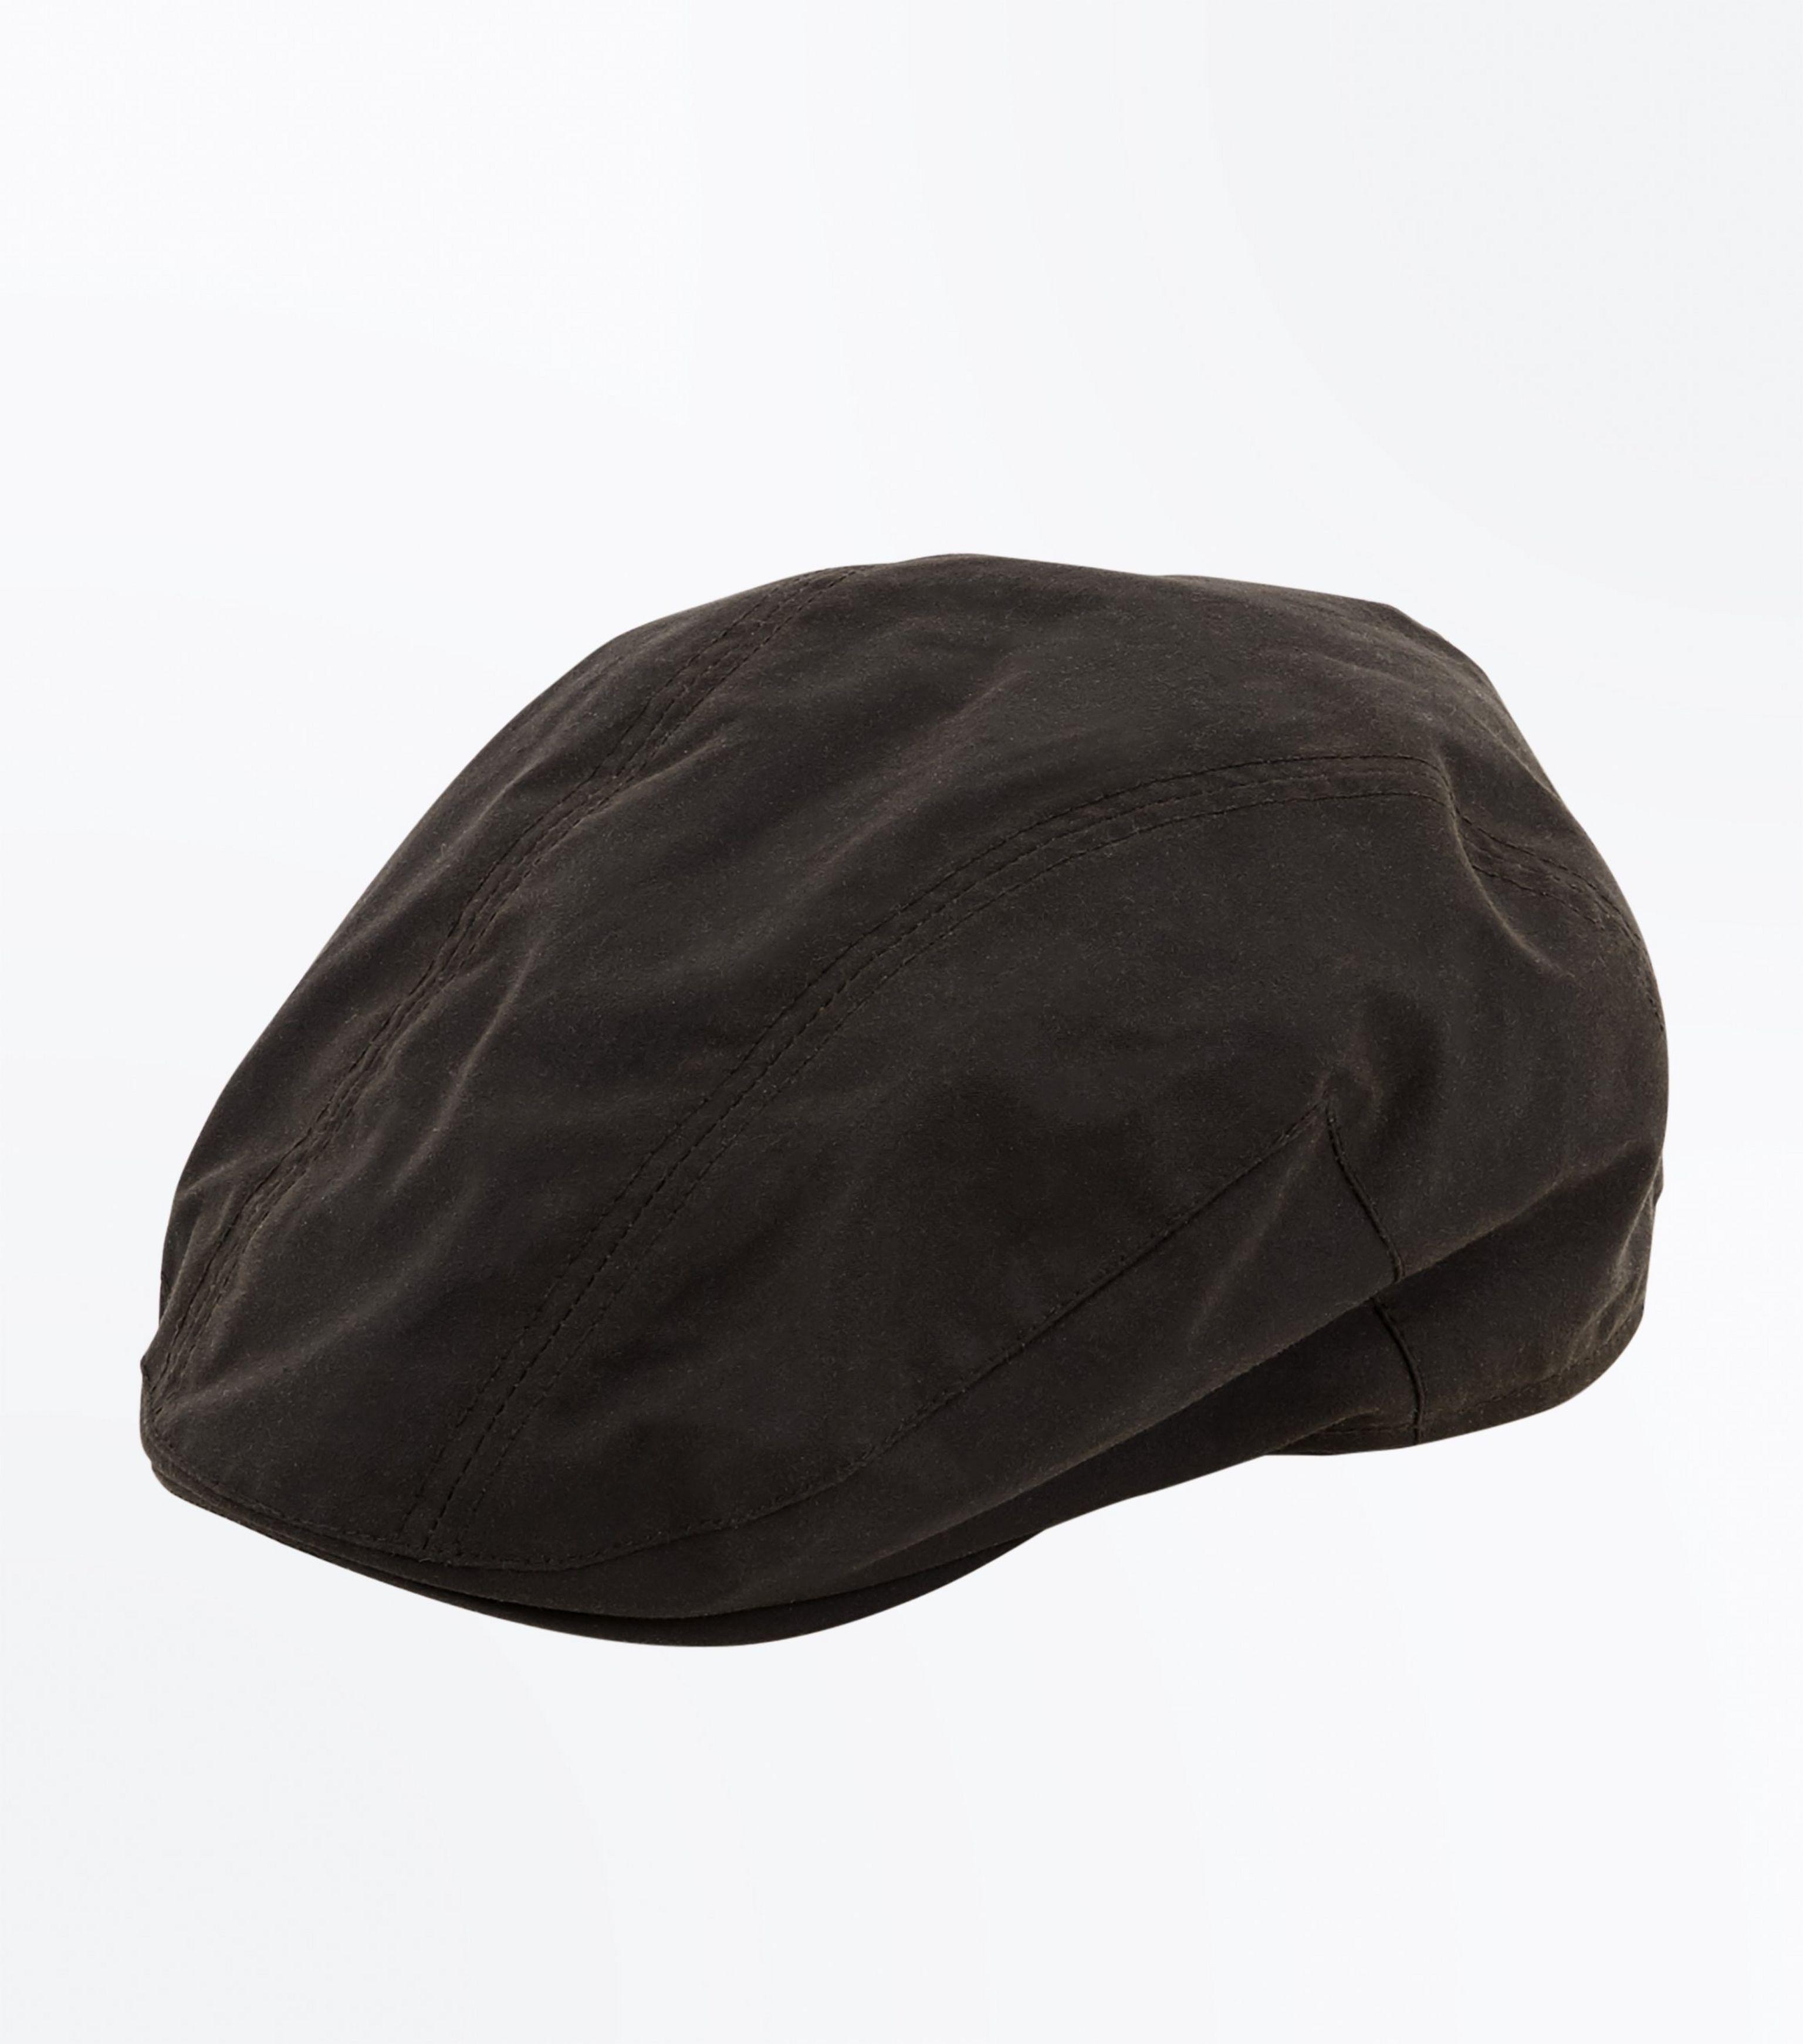 aeeeb0f5a2e New Look Khaki Washed Canvas Flat Cap for Men - Lyst